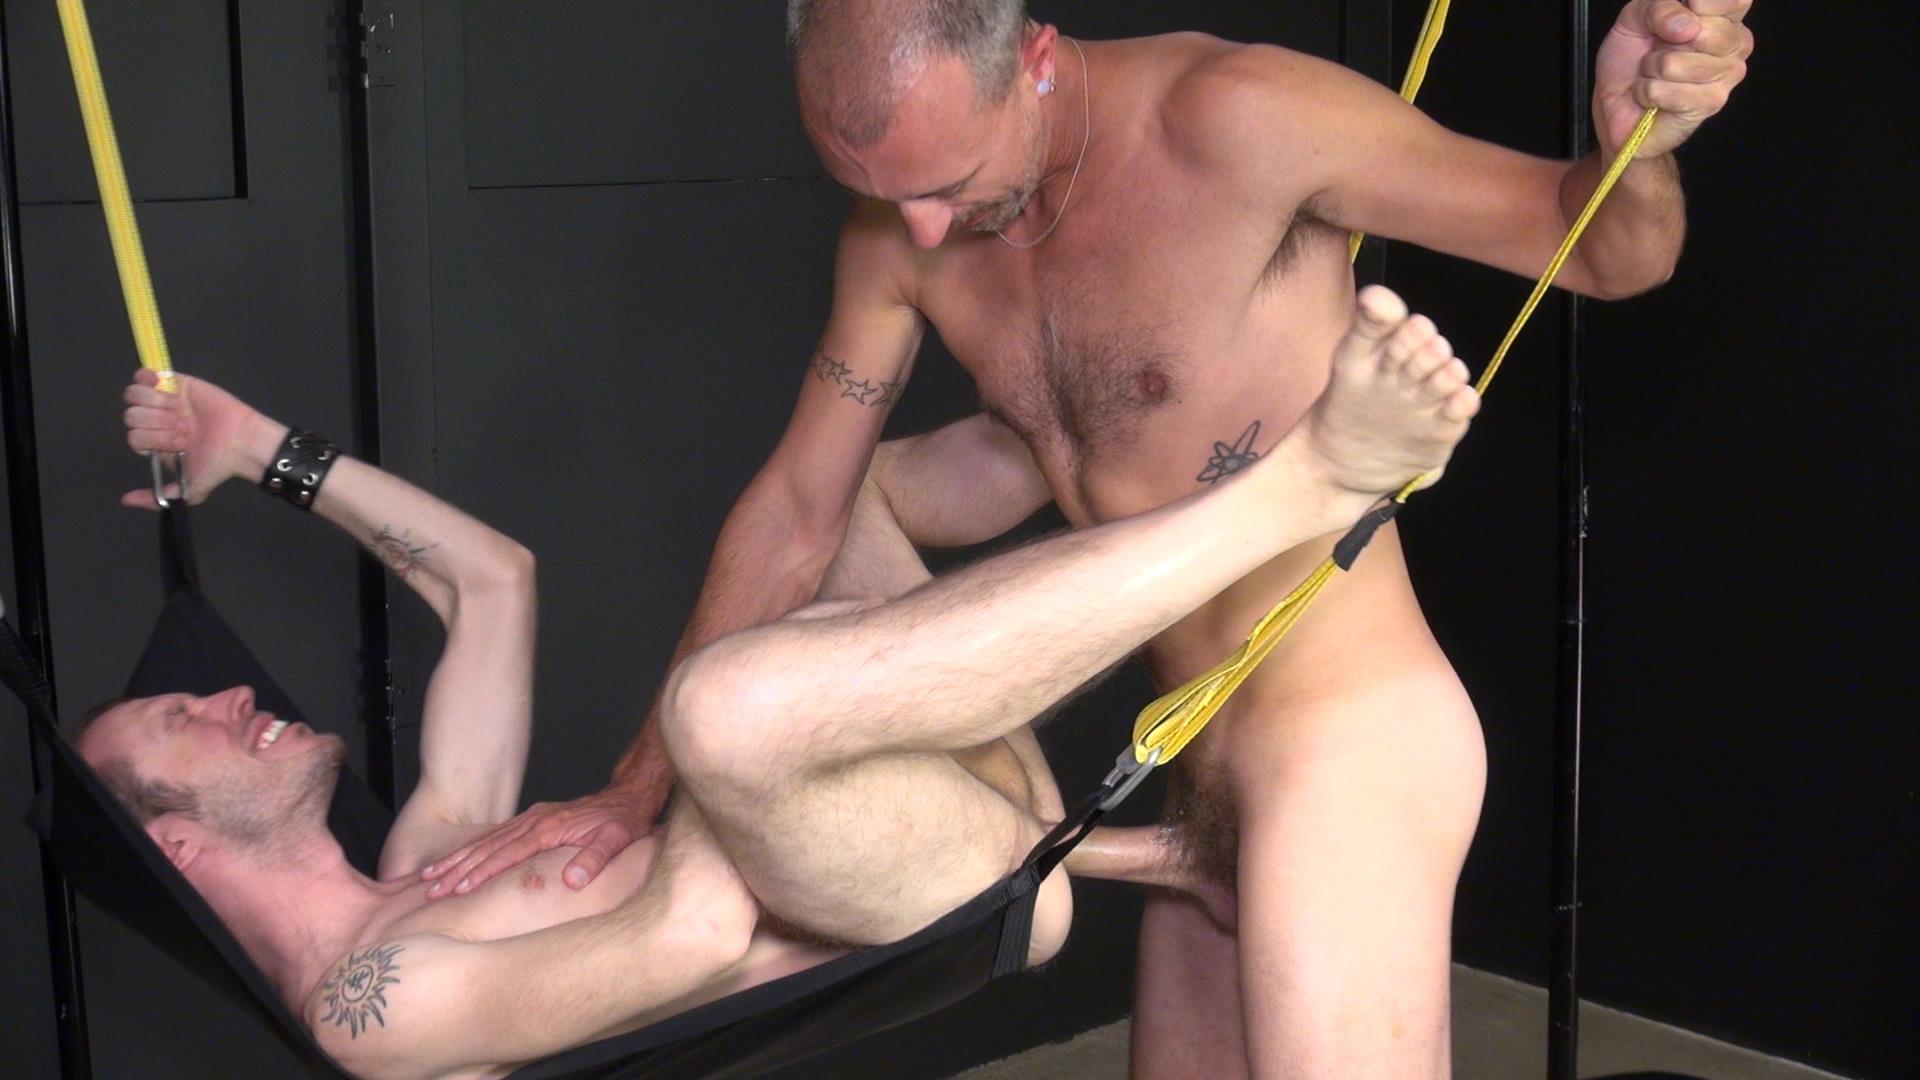 Raw-and-Rough-Blake-Dawson-and-Super-Steve-Horse-Cock-Bareback-Breeding-Amateur-Gay-Porn-07 Huge Cock Bareback Breeding A Tight Hole In A Sex Sling